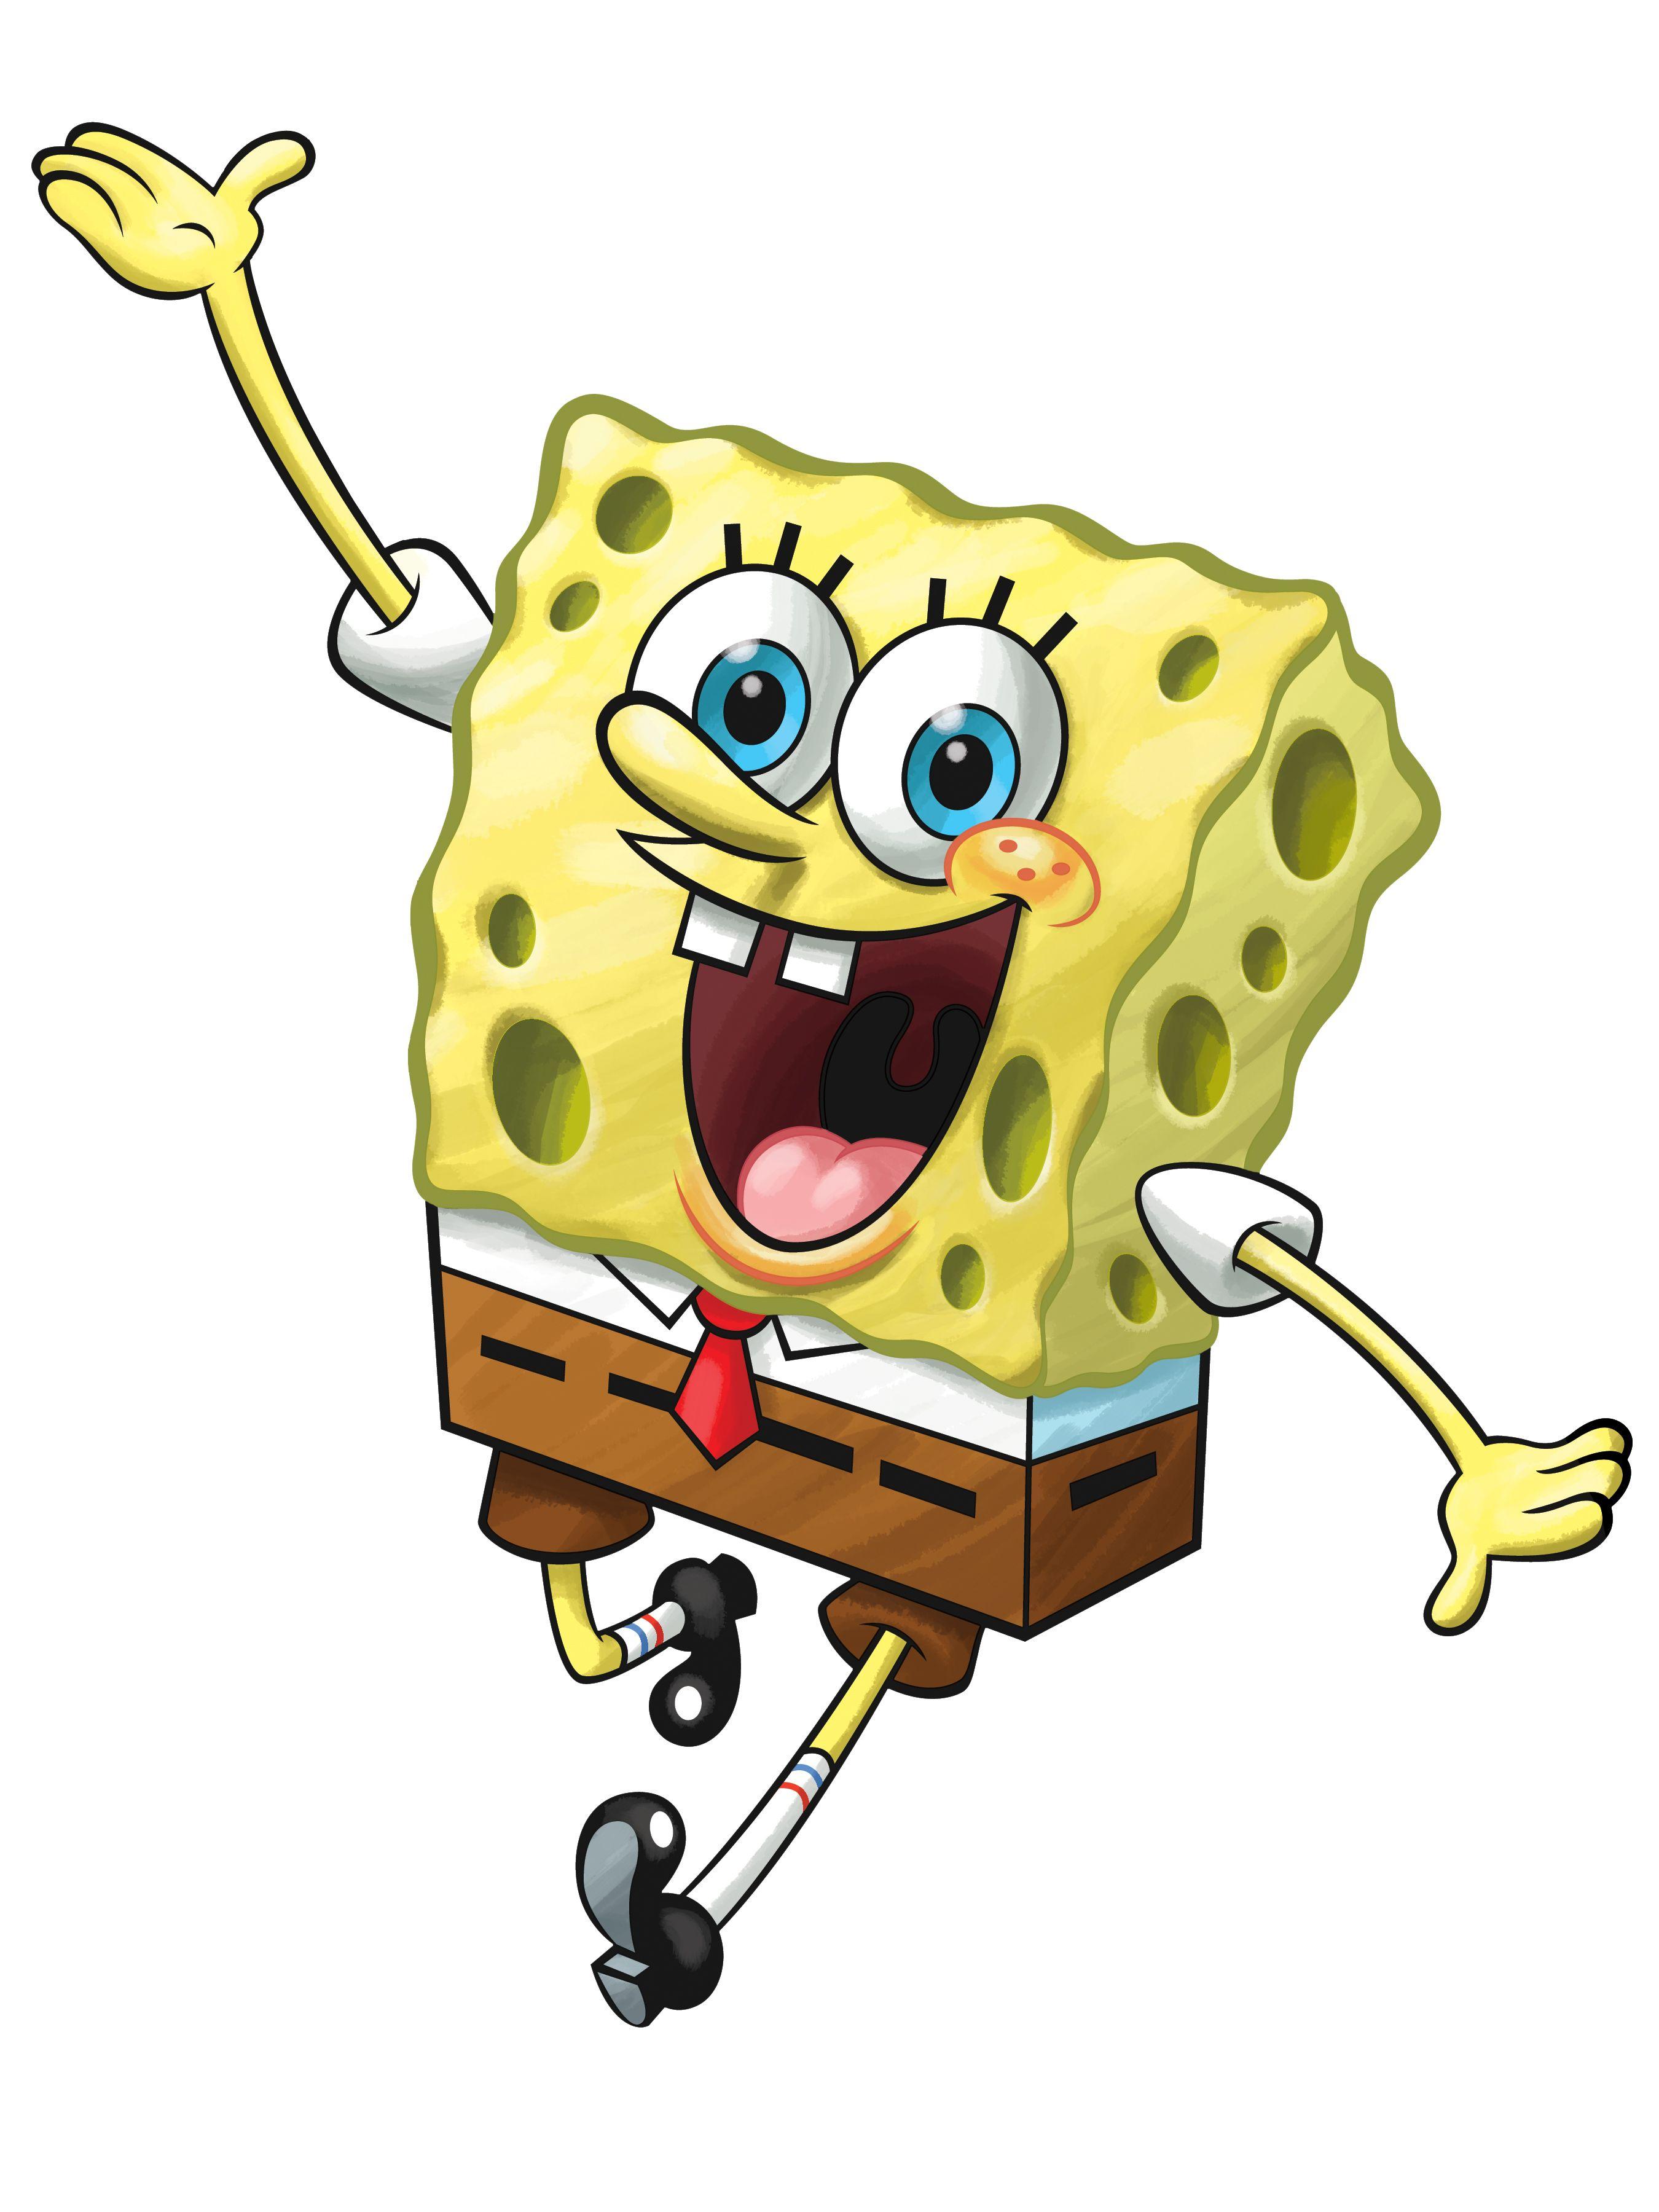 Spongebob Squarepants ... Spongebob Excited Face